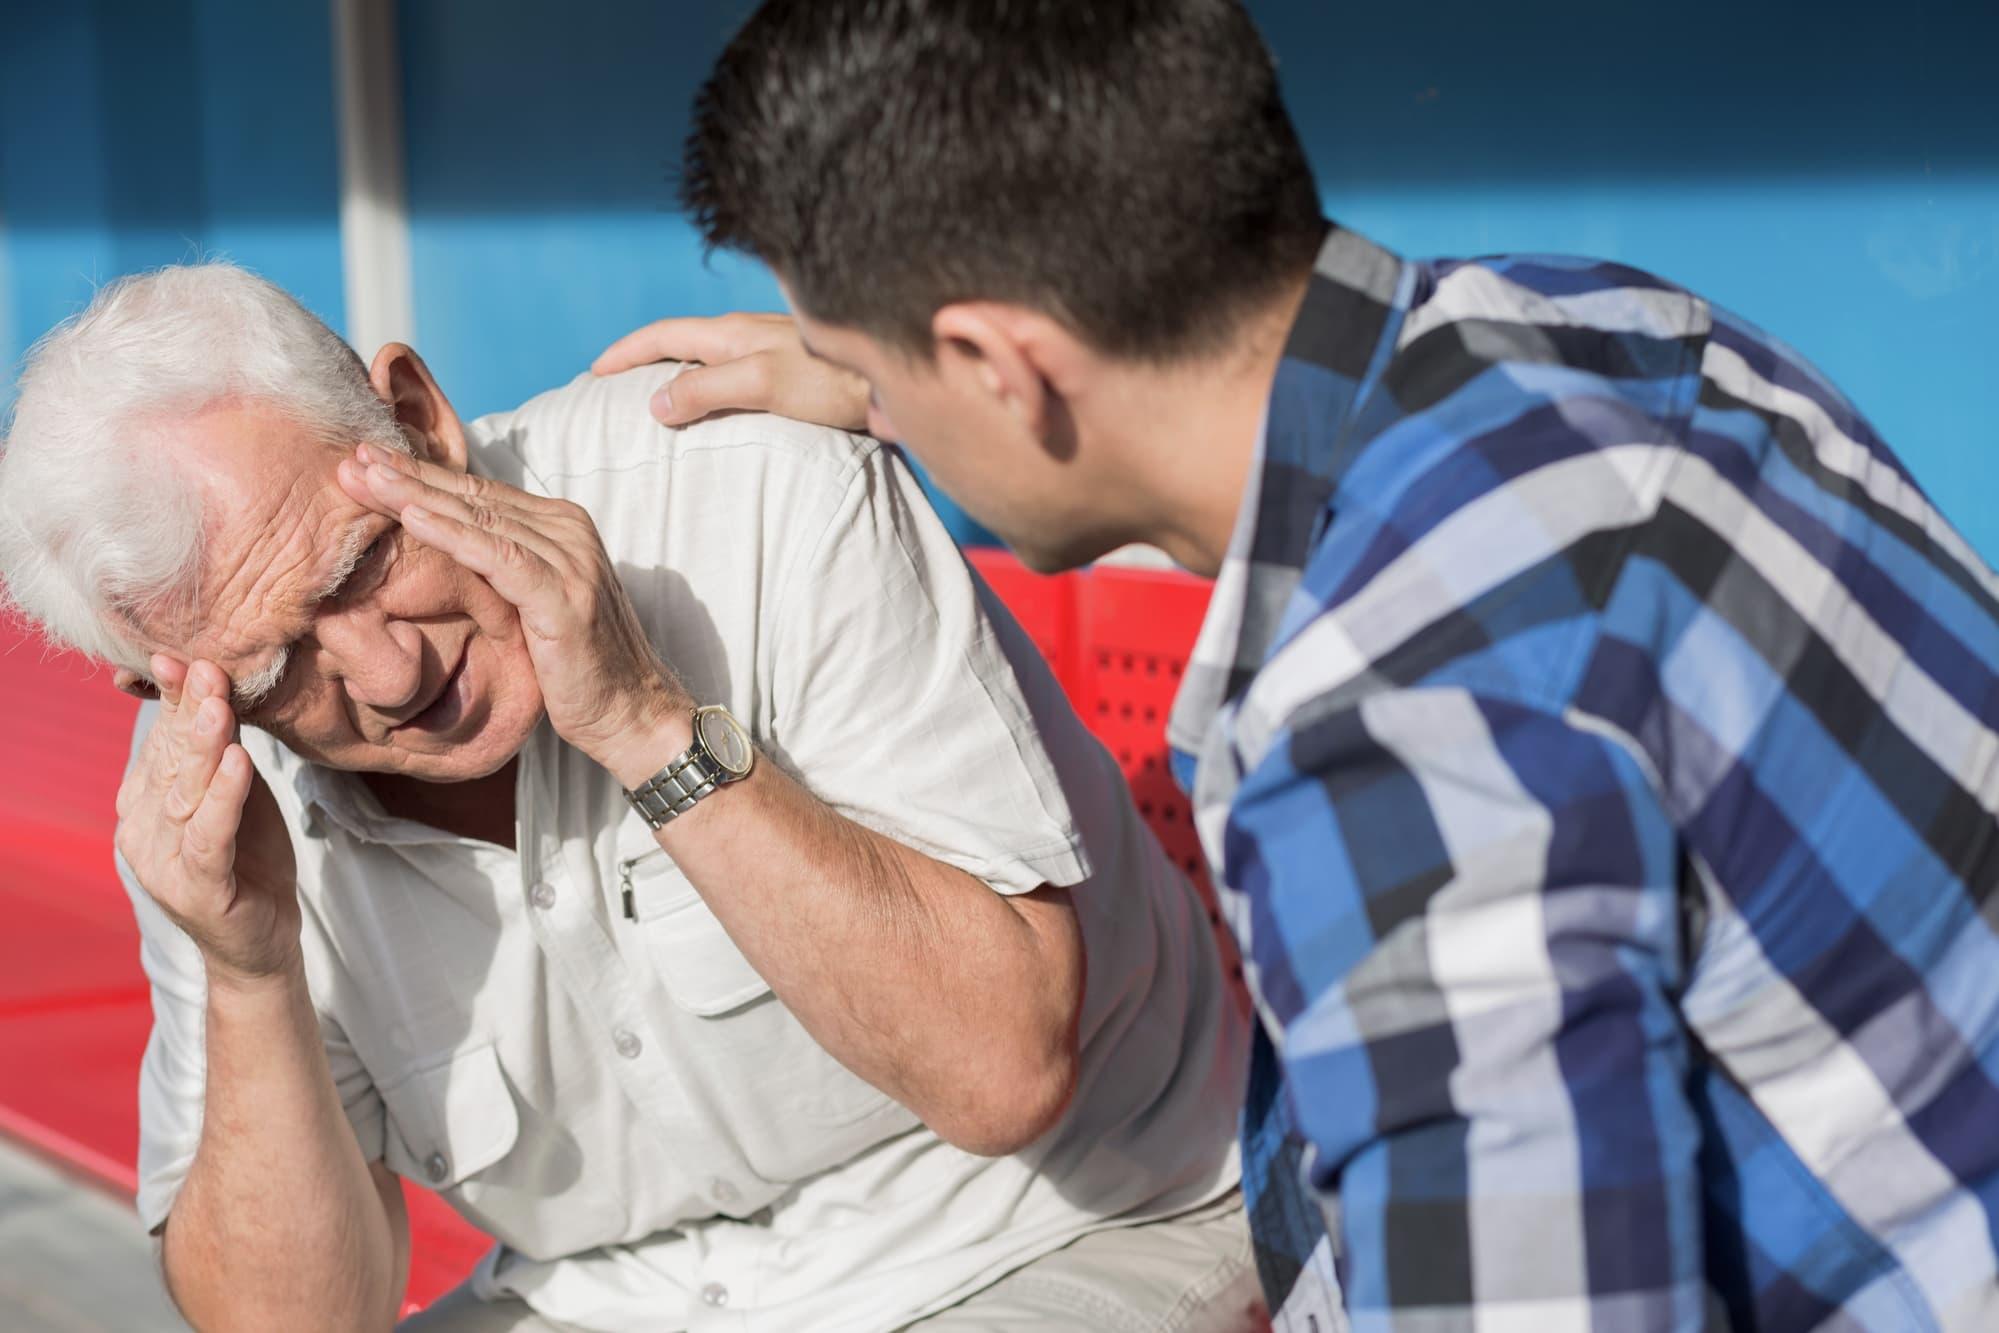 Elderly man suffering from Vertigo